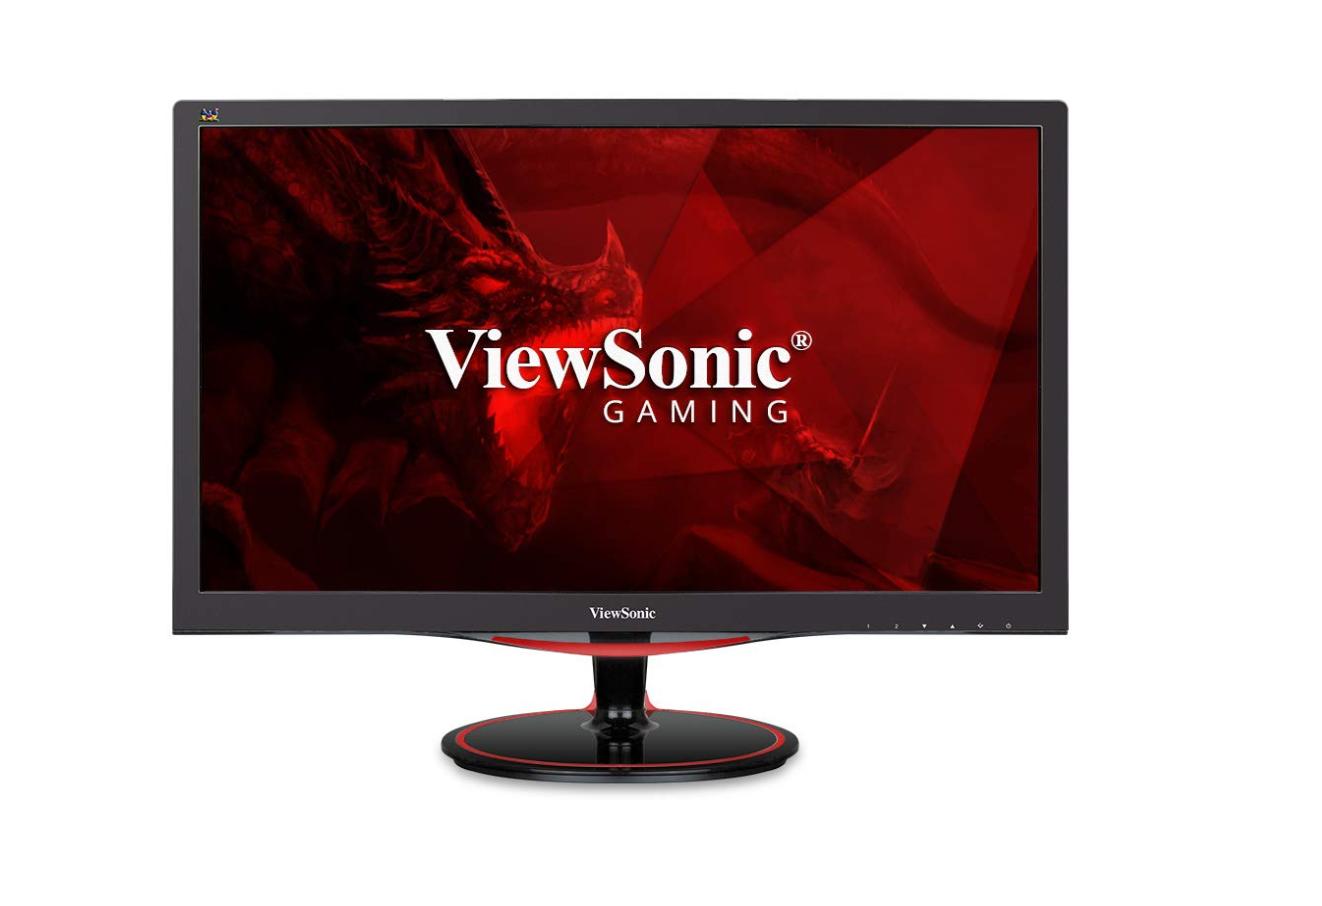 ViewSonic VX2458-MHD 24 Inch 1080p 1ms 144 Hz Gaming Monitor - $116.99 + Free Shipping